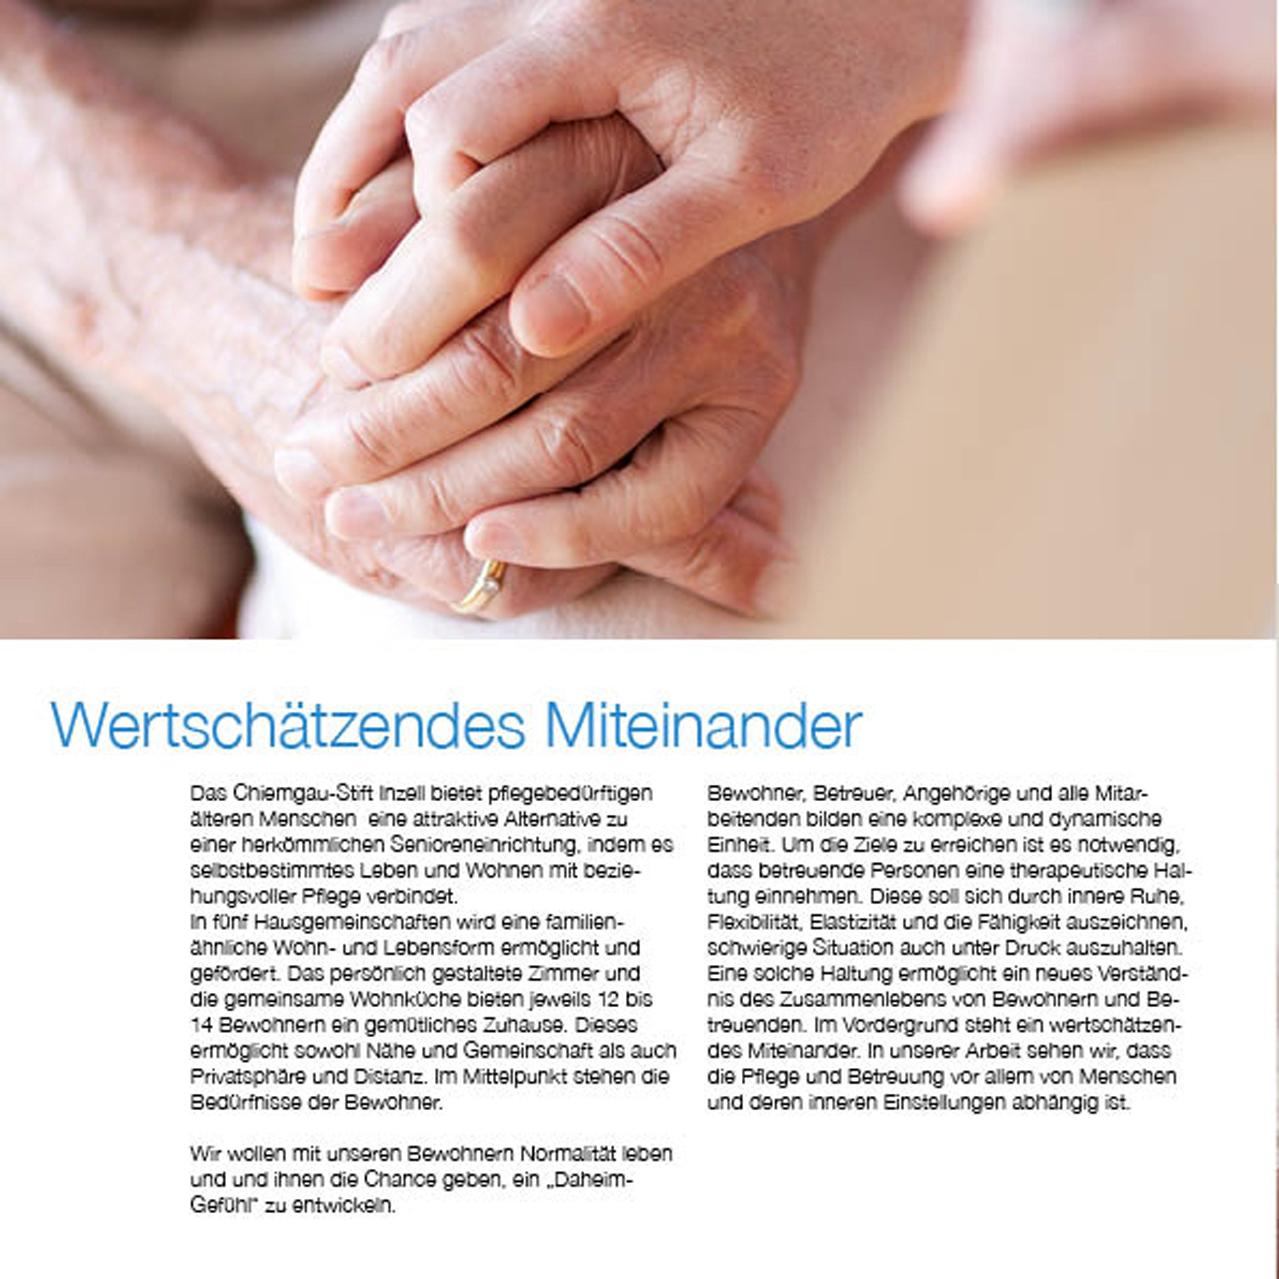 Advertising & Werbefotografie von PICT Images Tom Freudenberg / Tom Zilker